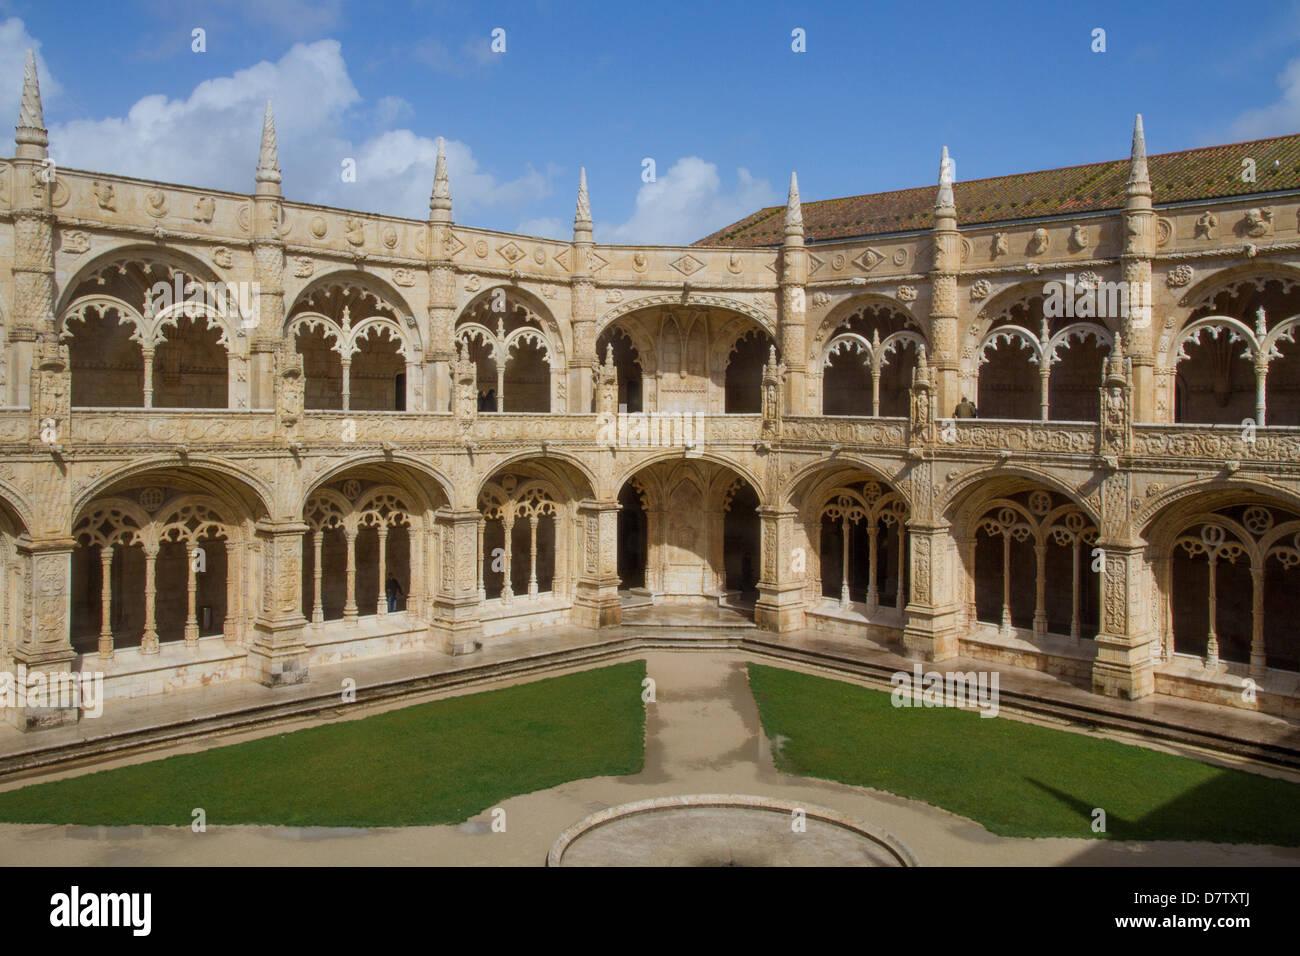 Cloisters, Jeronimos Monastery, UNESCO World Heritage Site, Lisbon, Portugal - Stock Image